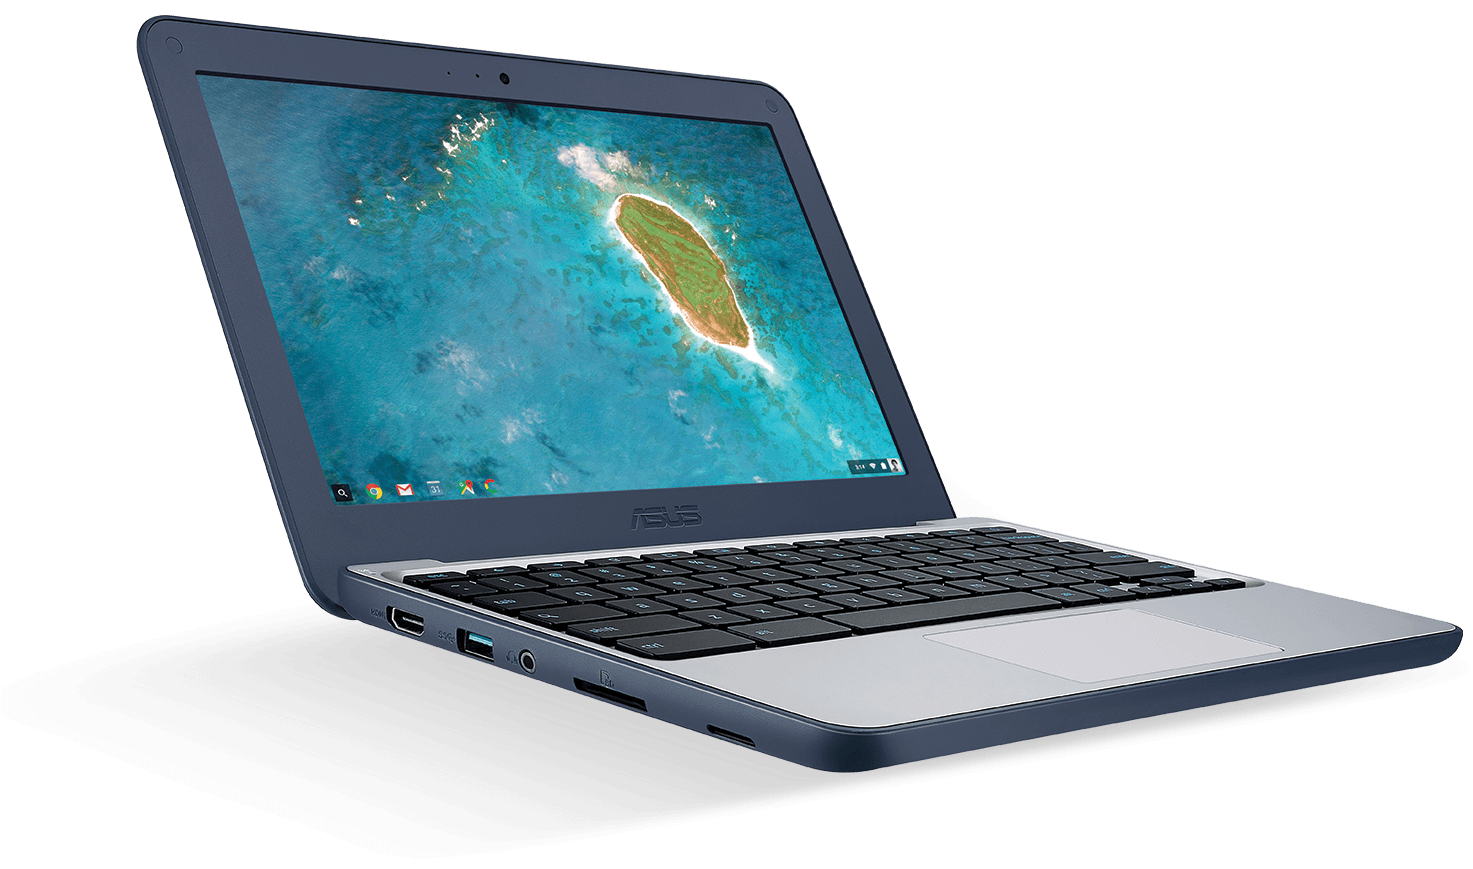 Asus Chromebook C202sa Laptops United Kingdom Laptop Wi Fi Wiring Diagram 360 Degrees Antenna